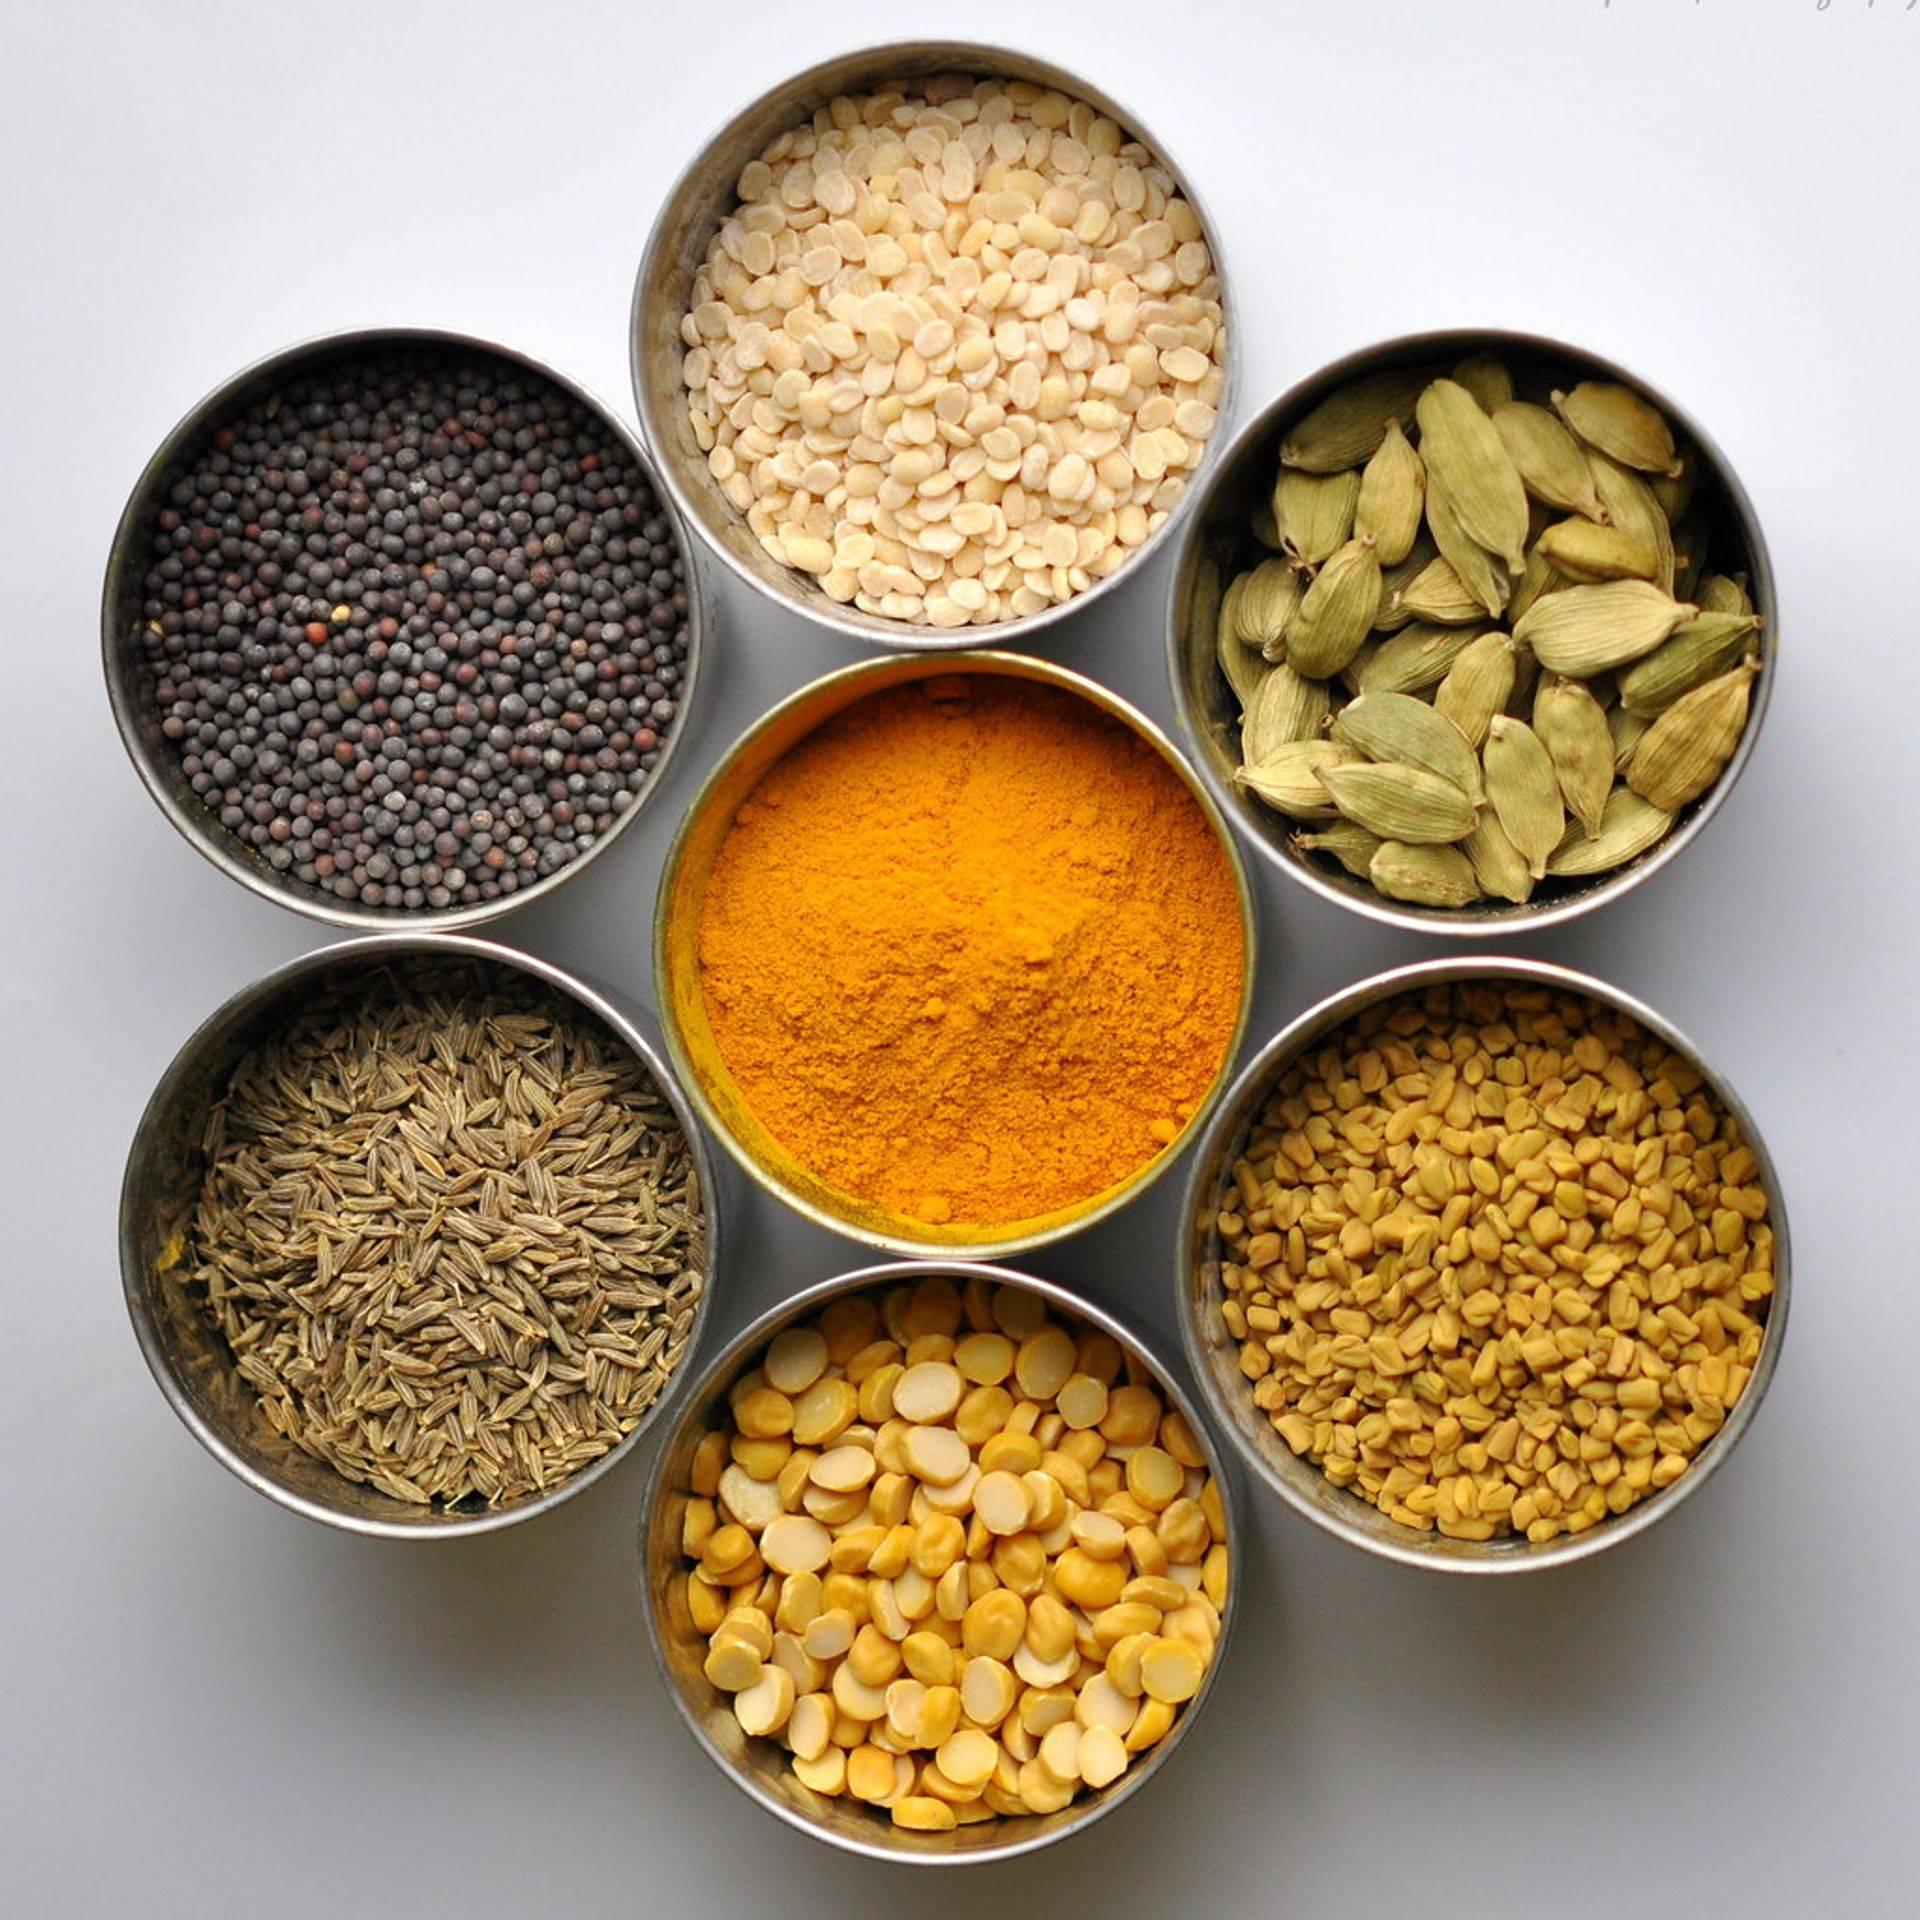 Naturopathic medicines